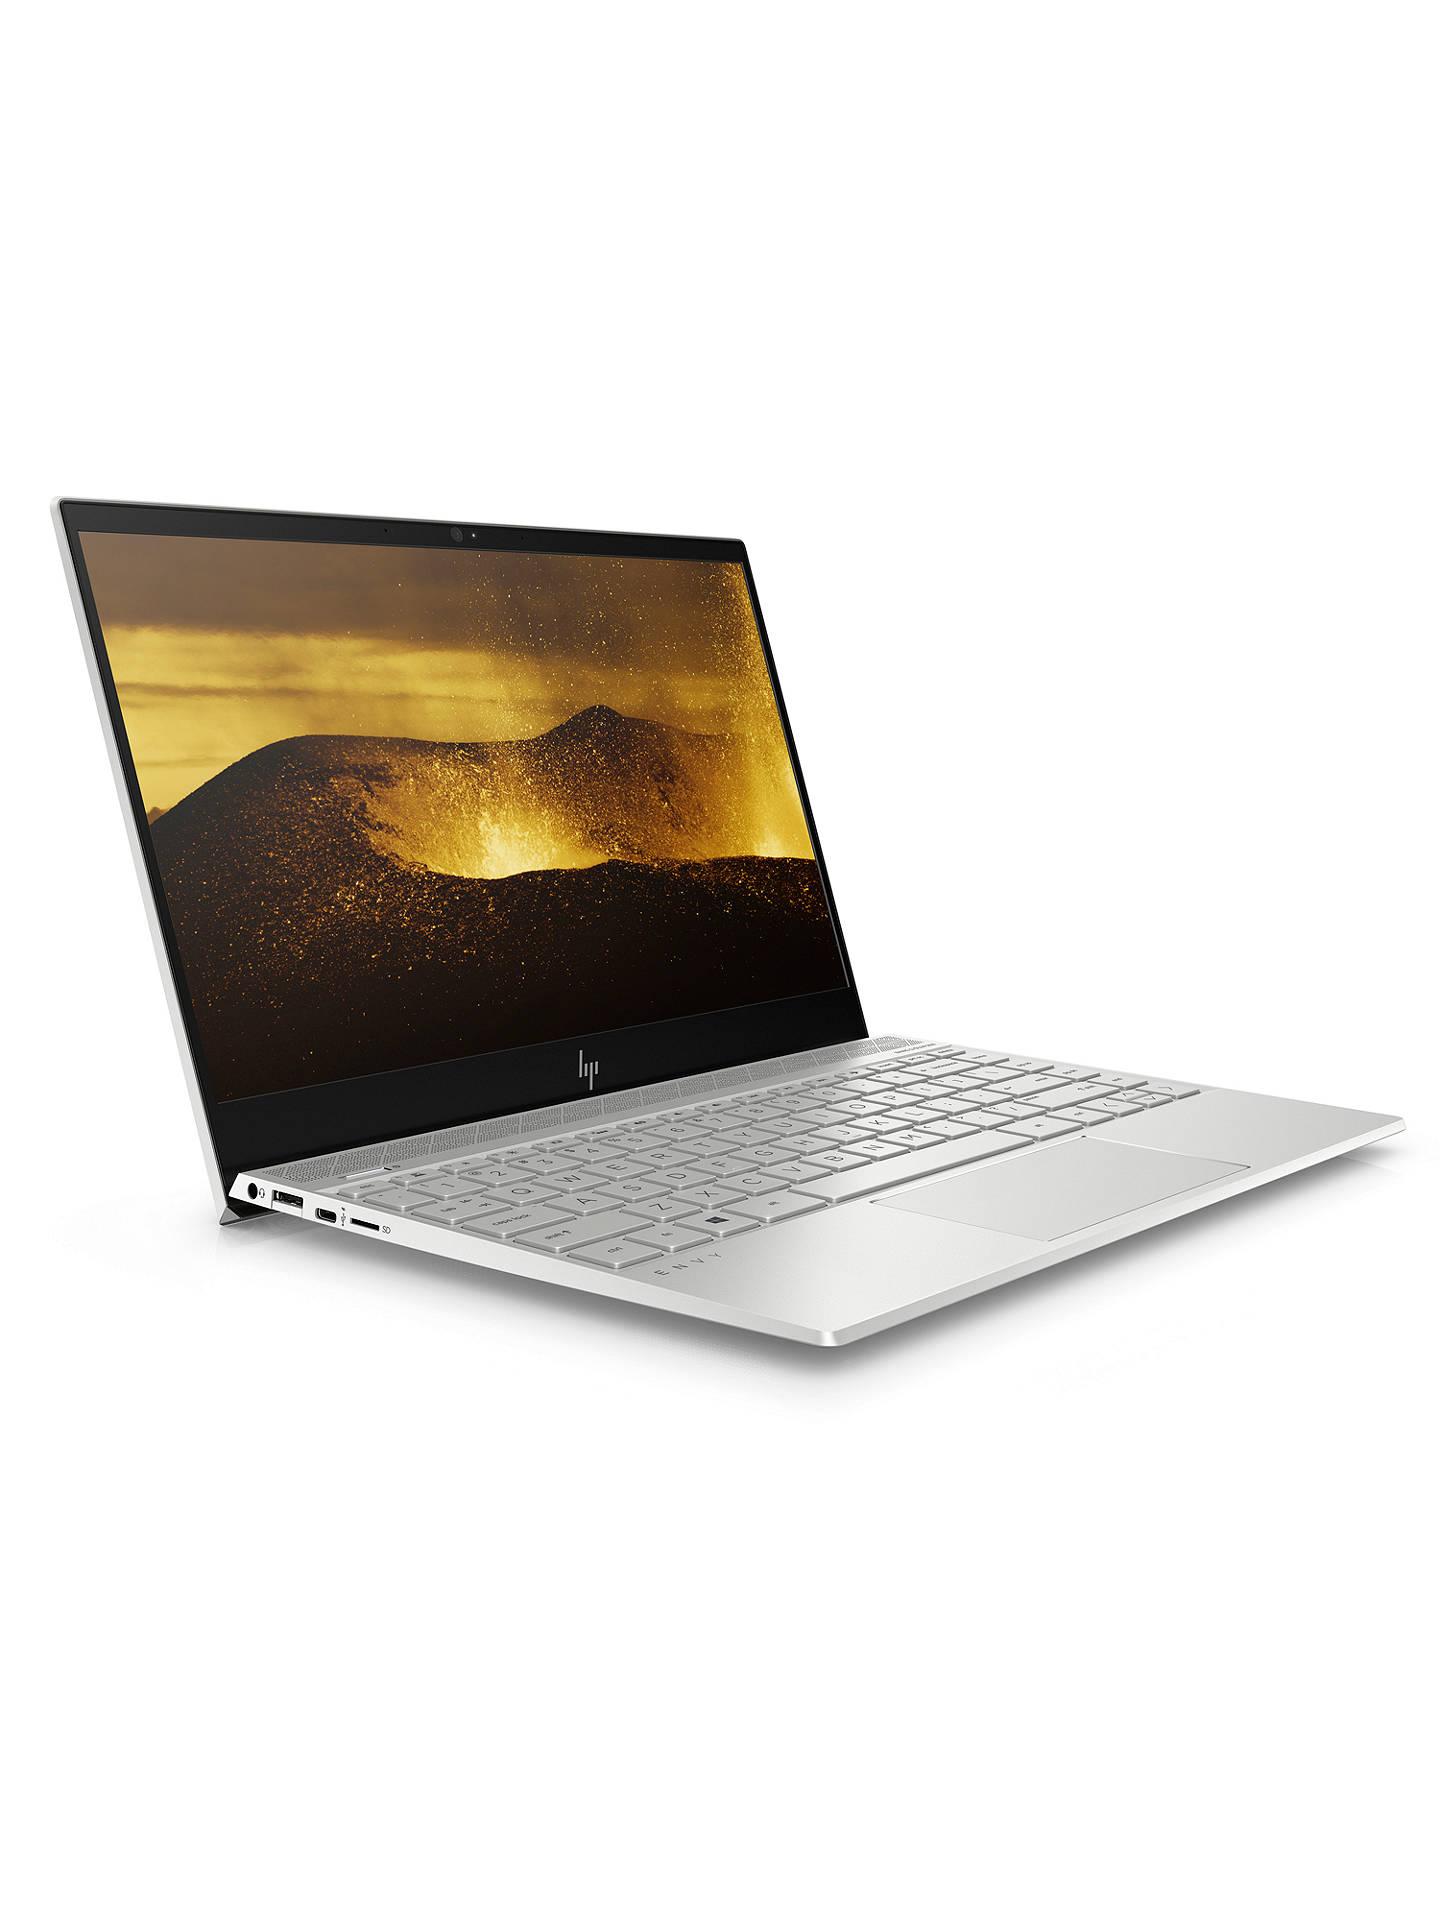 HP ENVY 13-ah0003na Laptop, Intel Core i7, 16GB RAM, 512GB SSD, 13 3